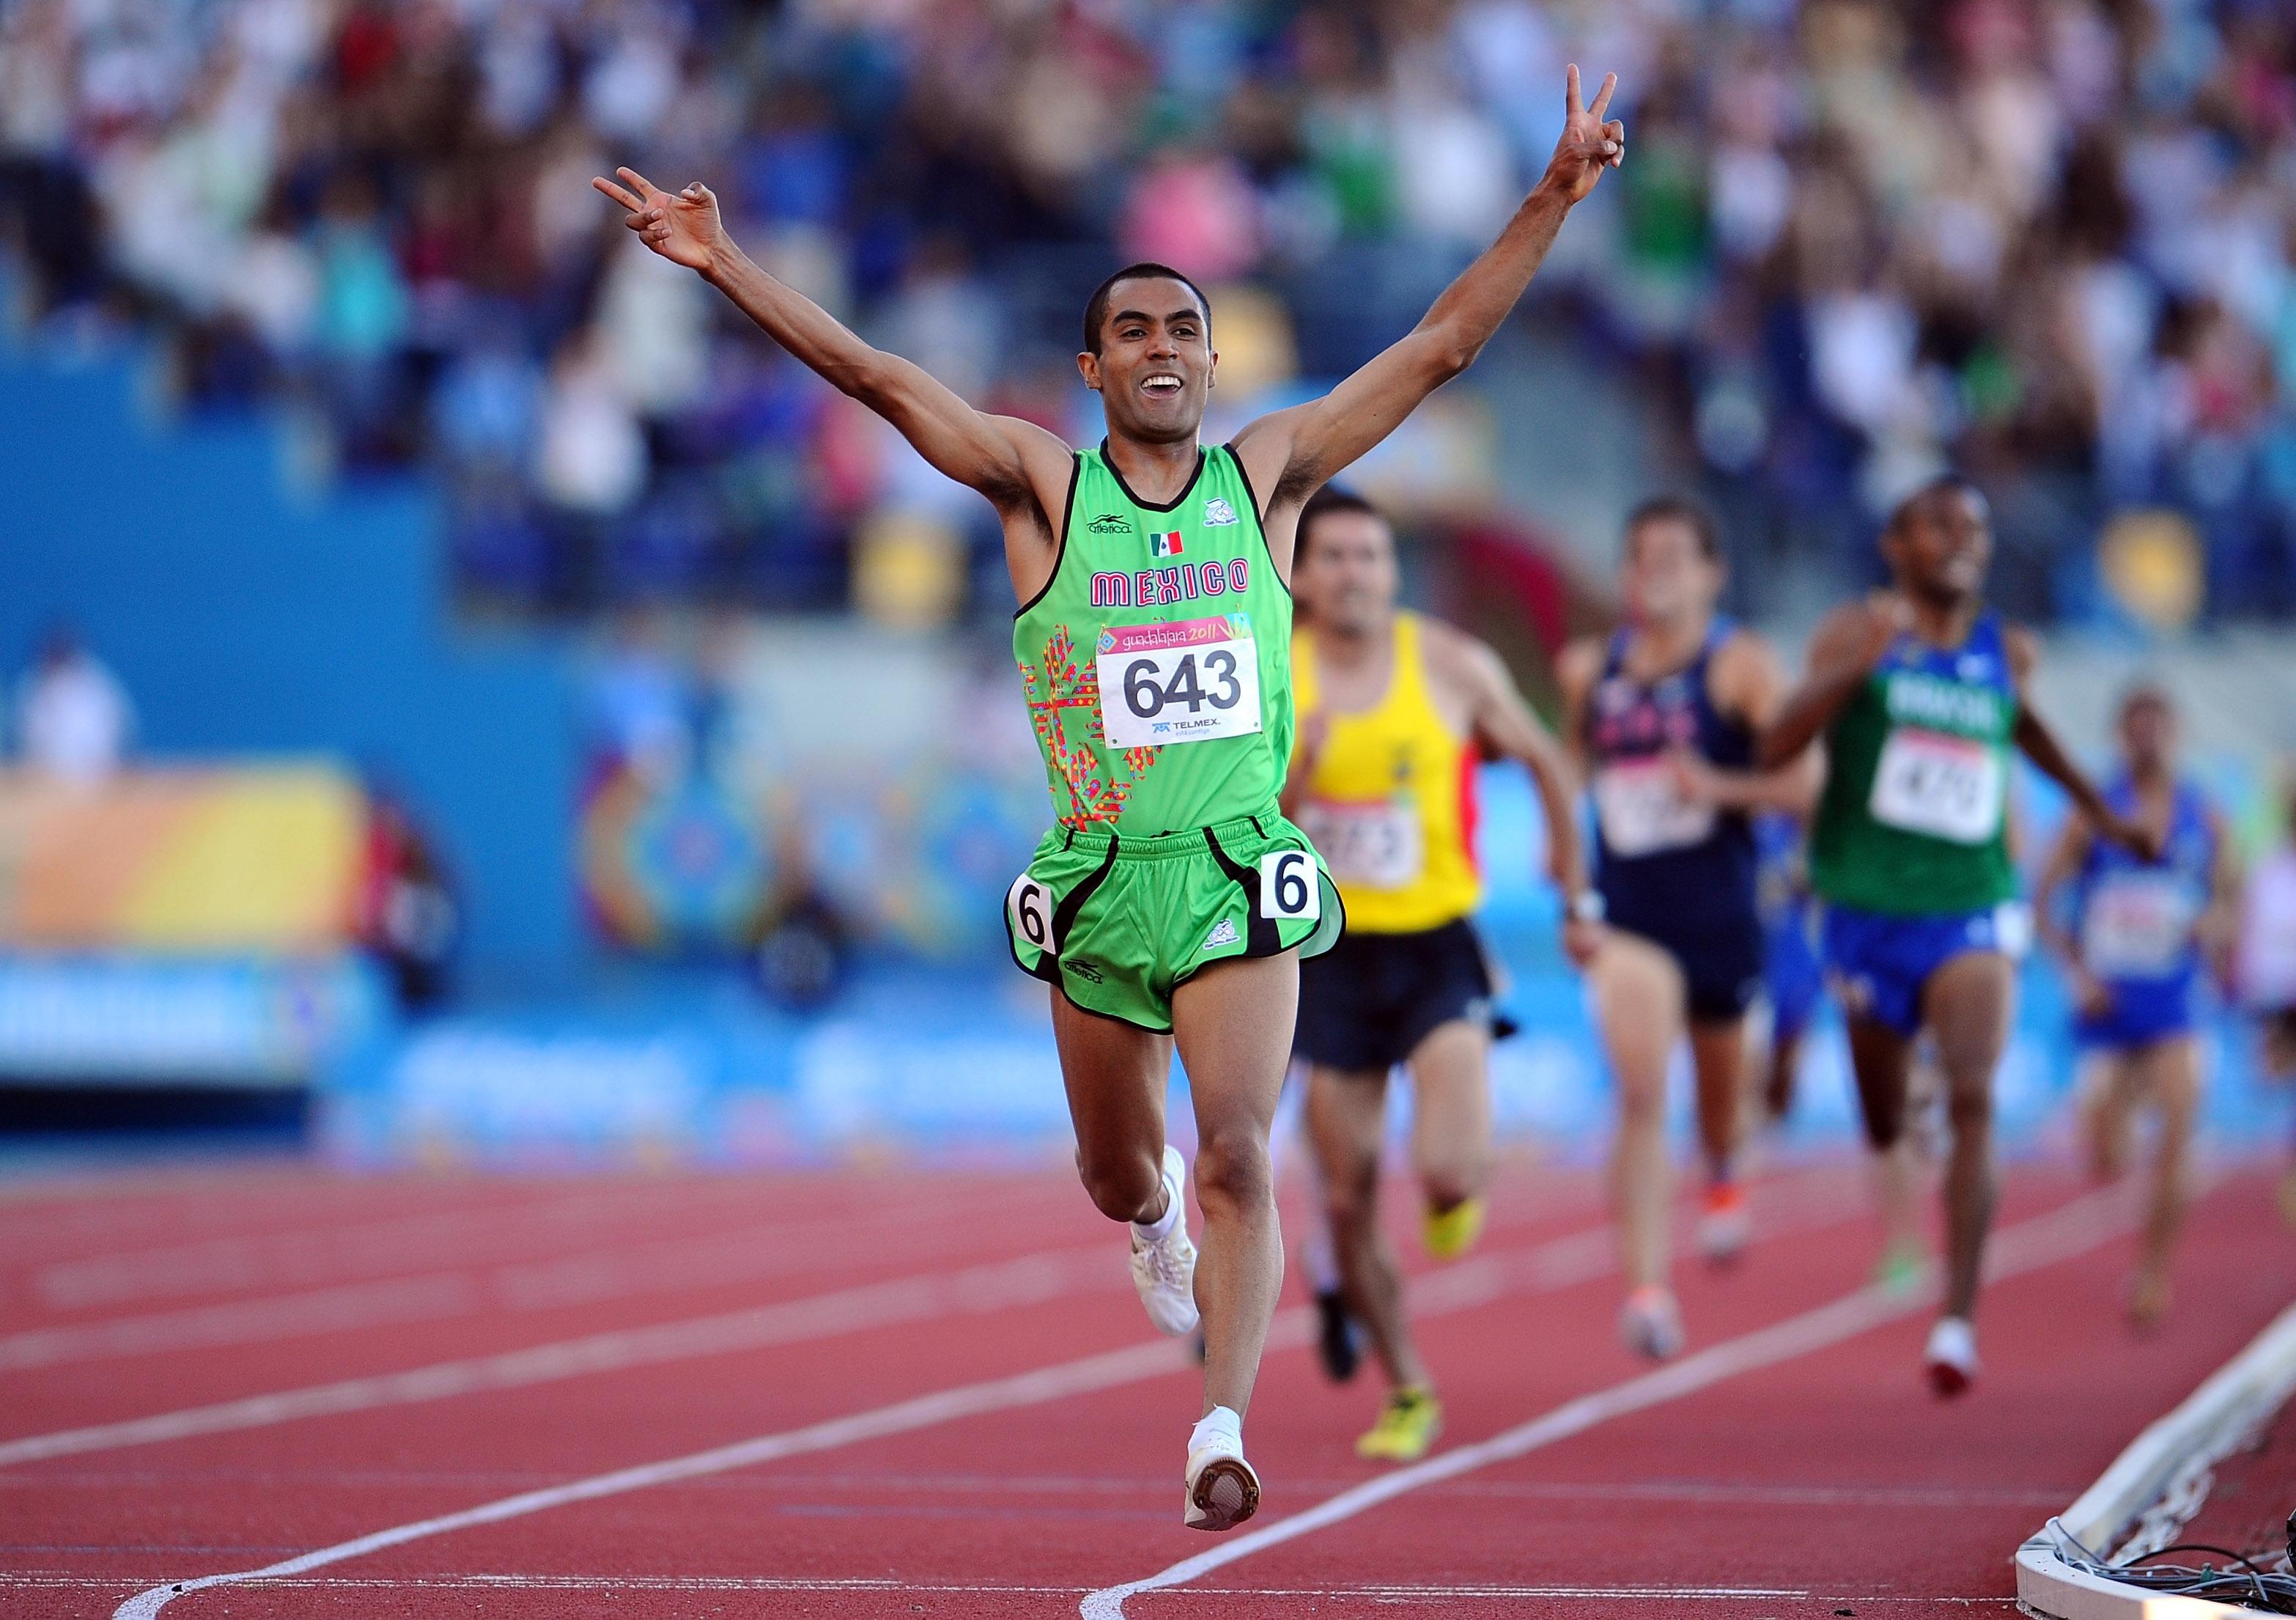 Juan Luis Barrios, Atleta, Corredor, Olímpicos, Medallista, Campeona